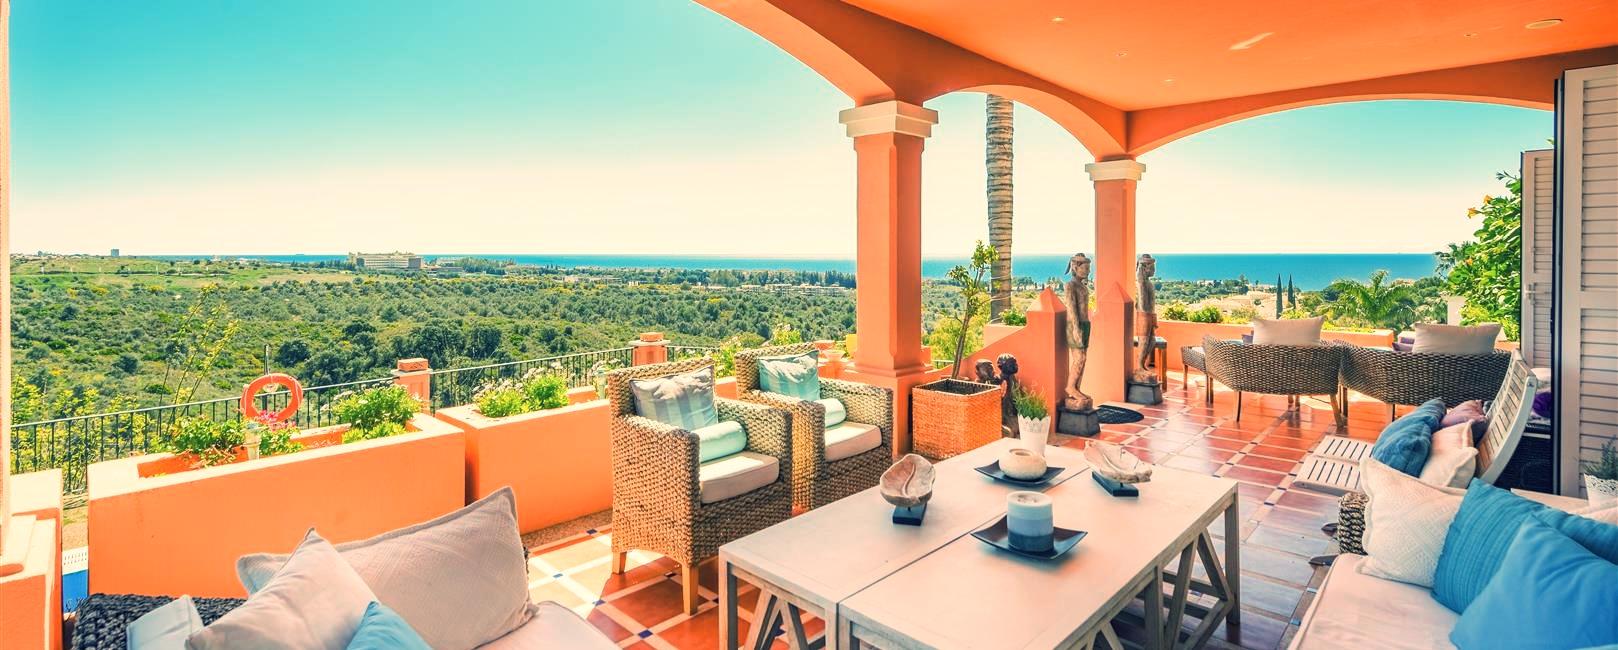 1.Rio Real Marbella Heights Hotel (Large).jpg